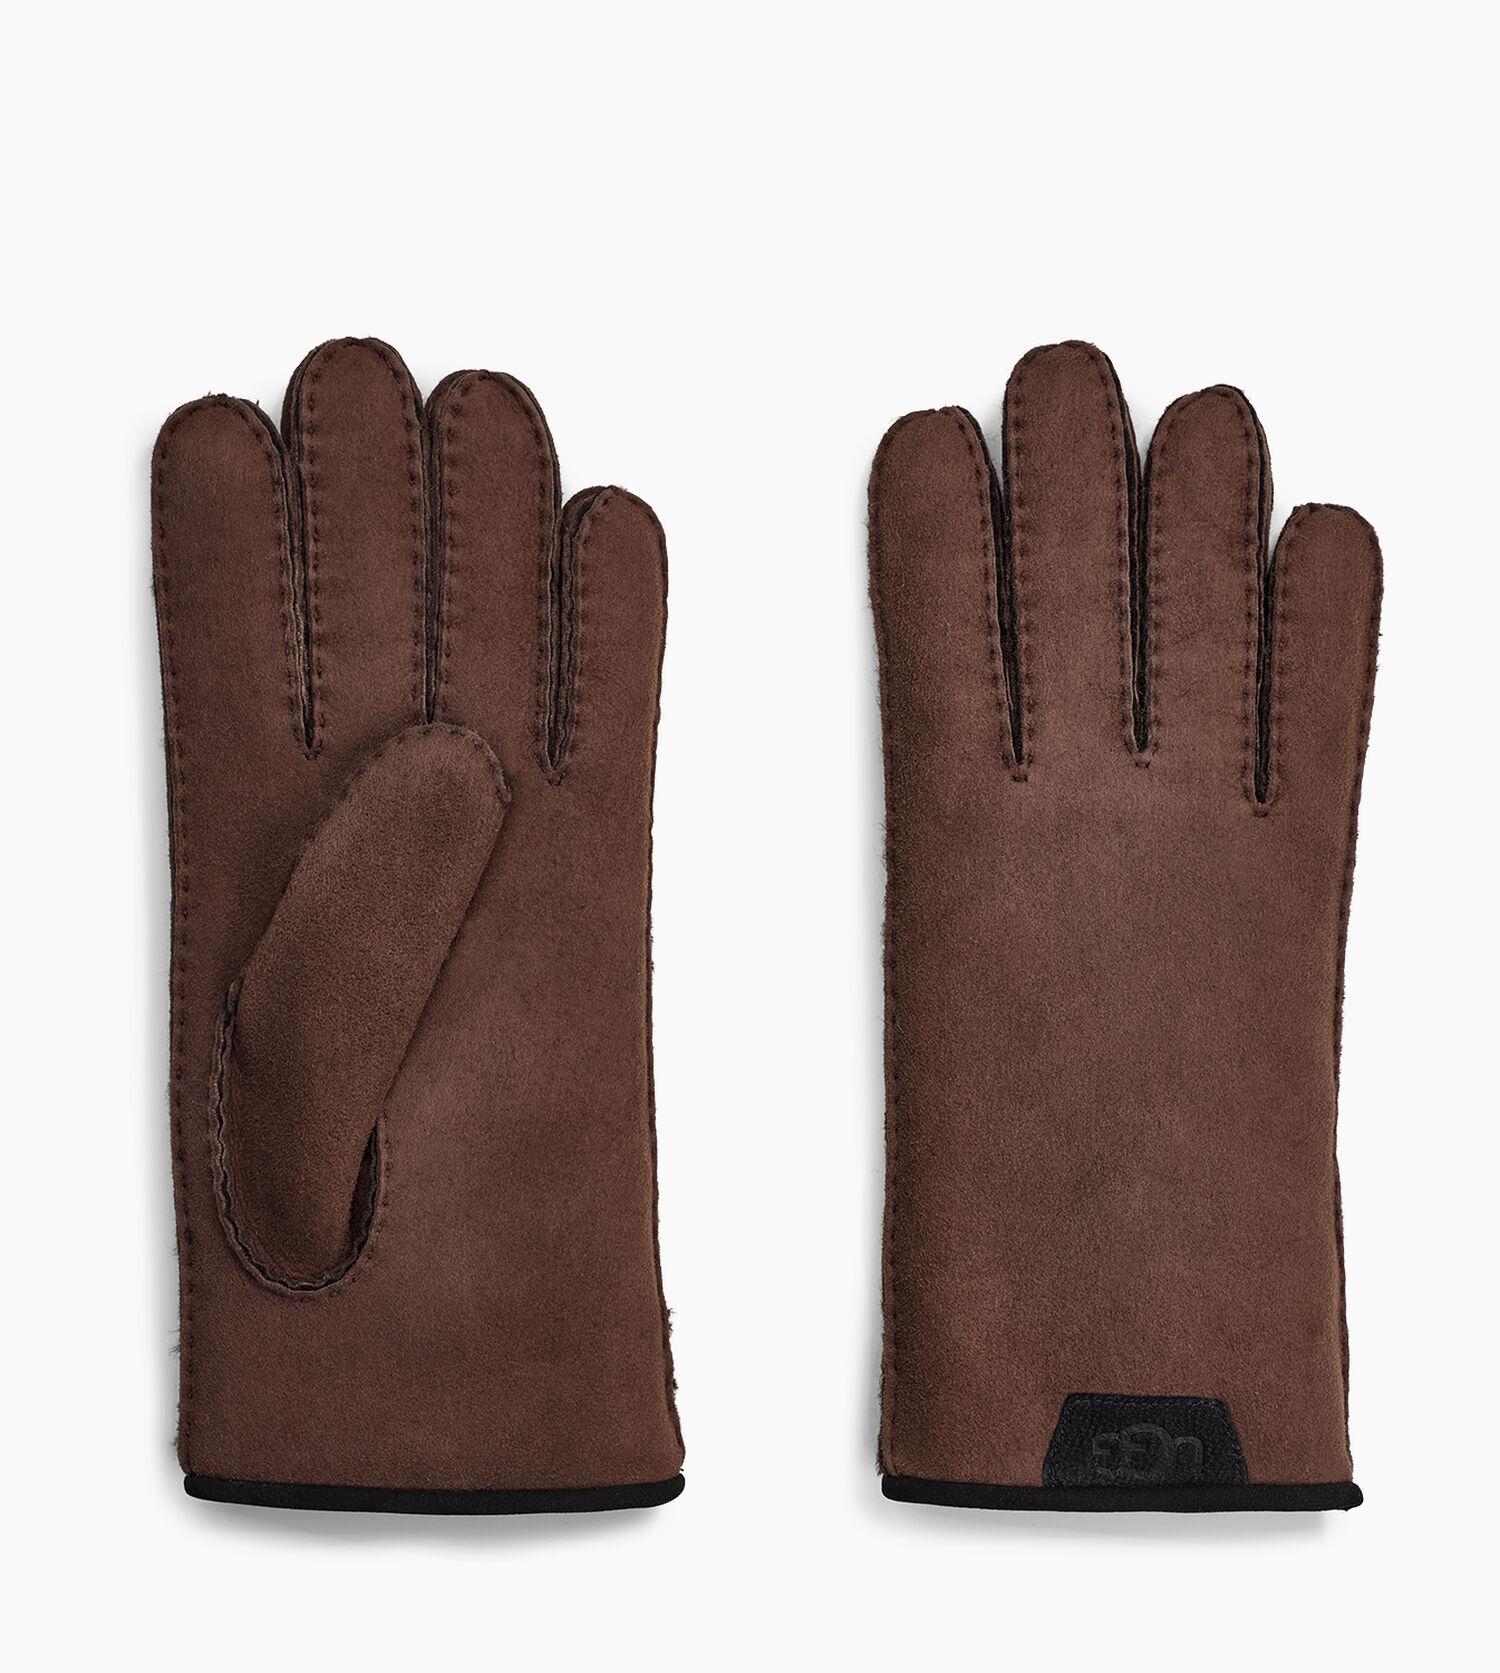 1e83fa1ebf0 Men's Share this product Shearling Glove